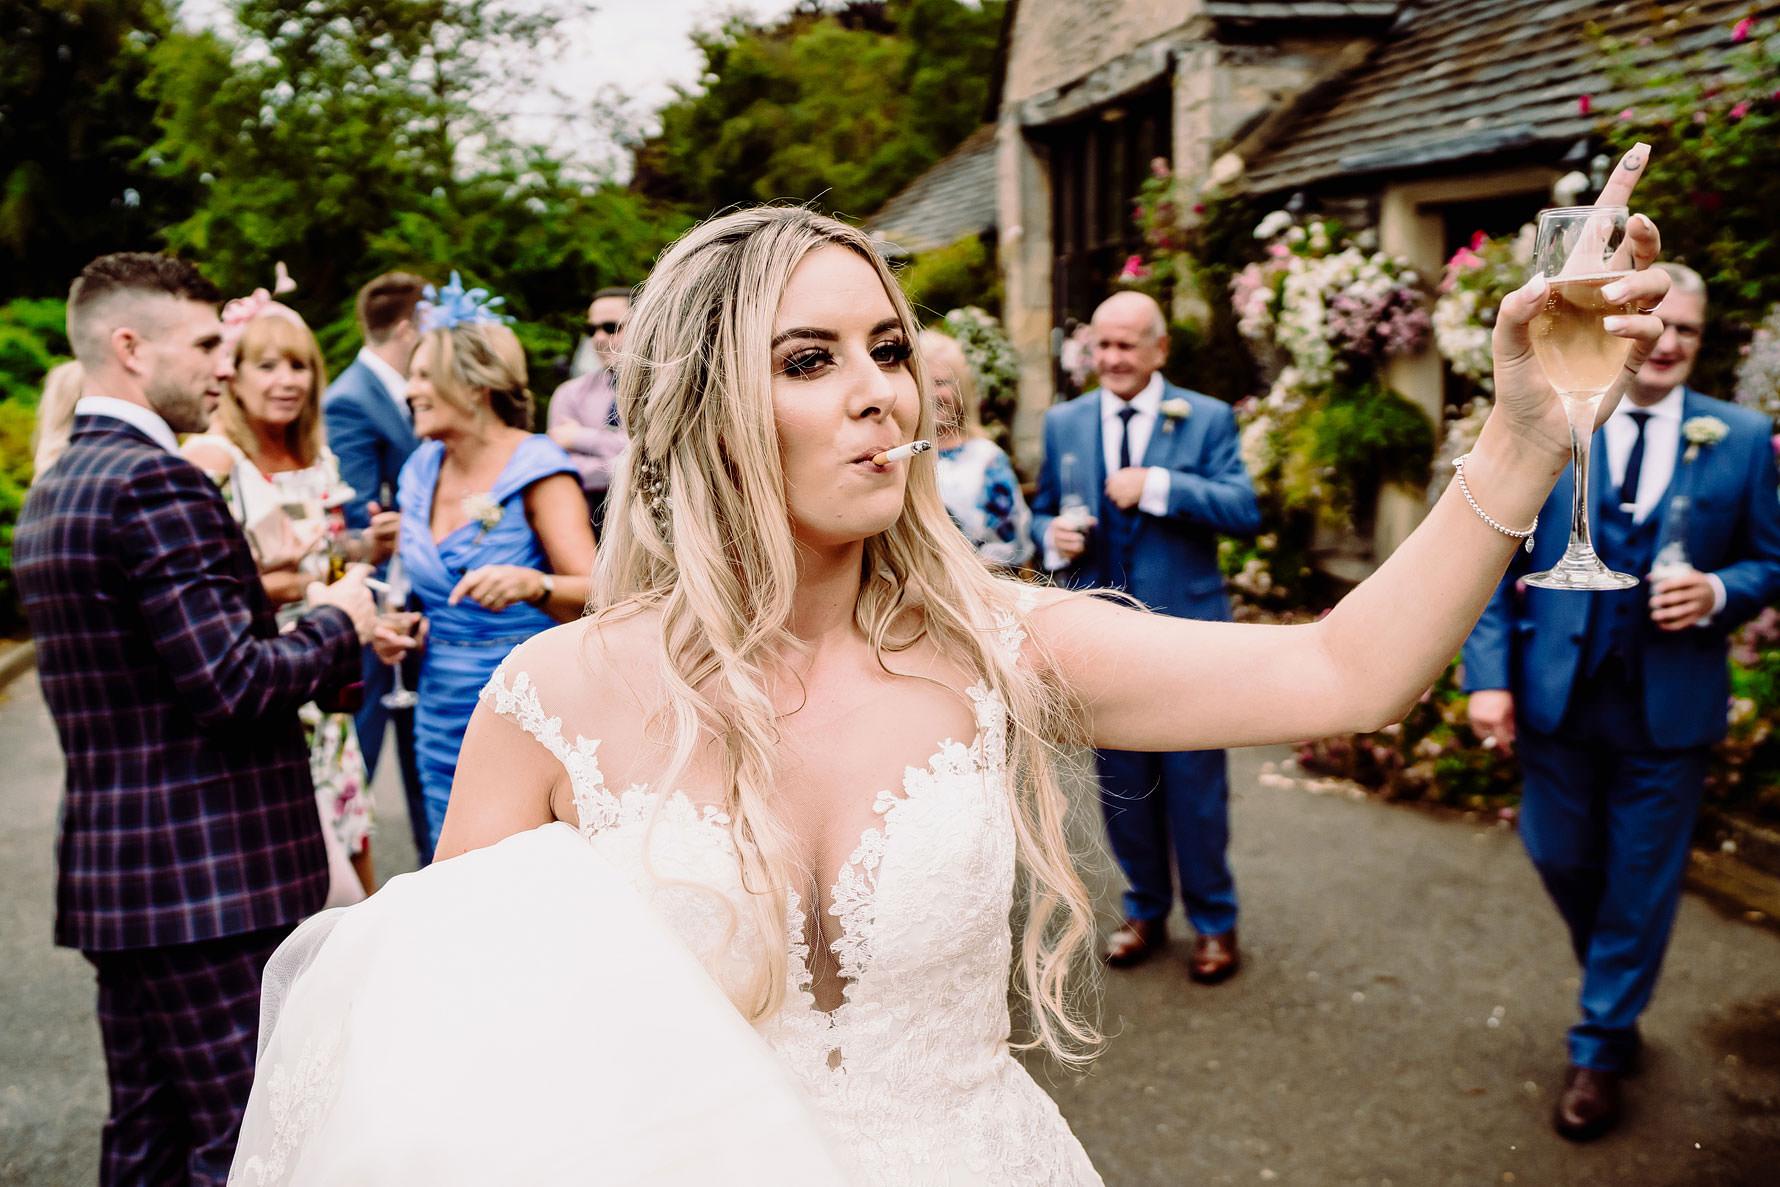 a alternative portrait of a bride